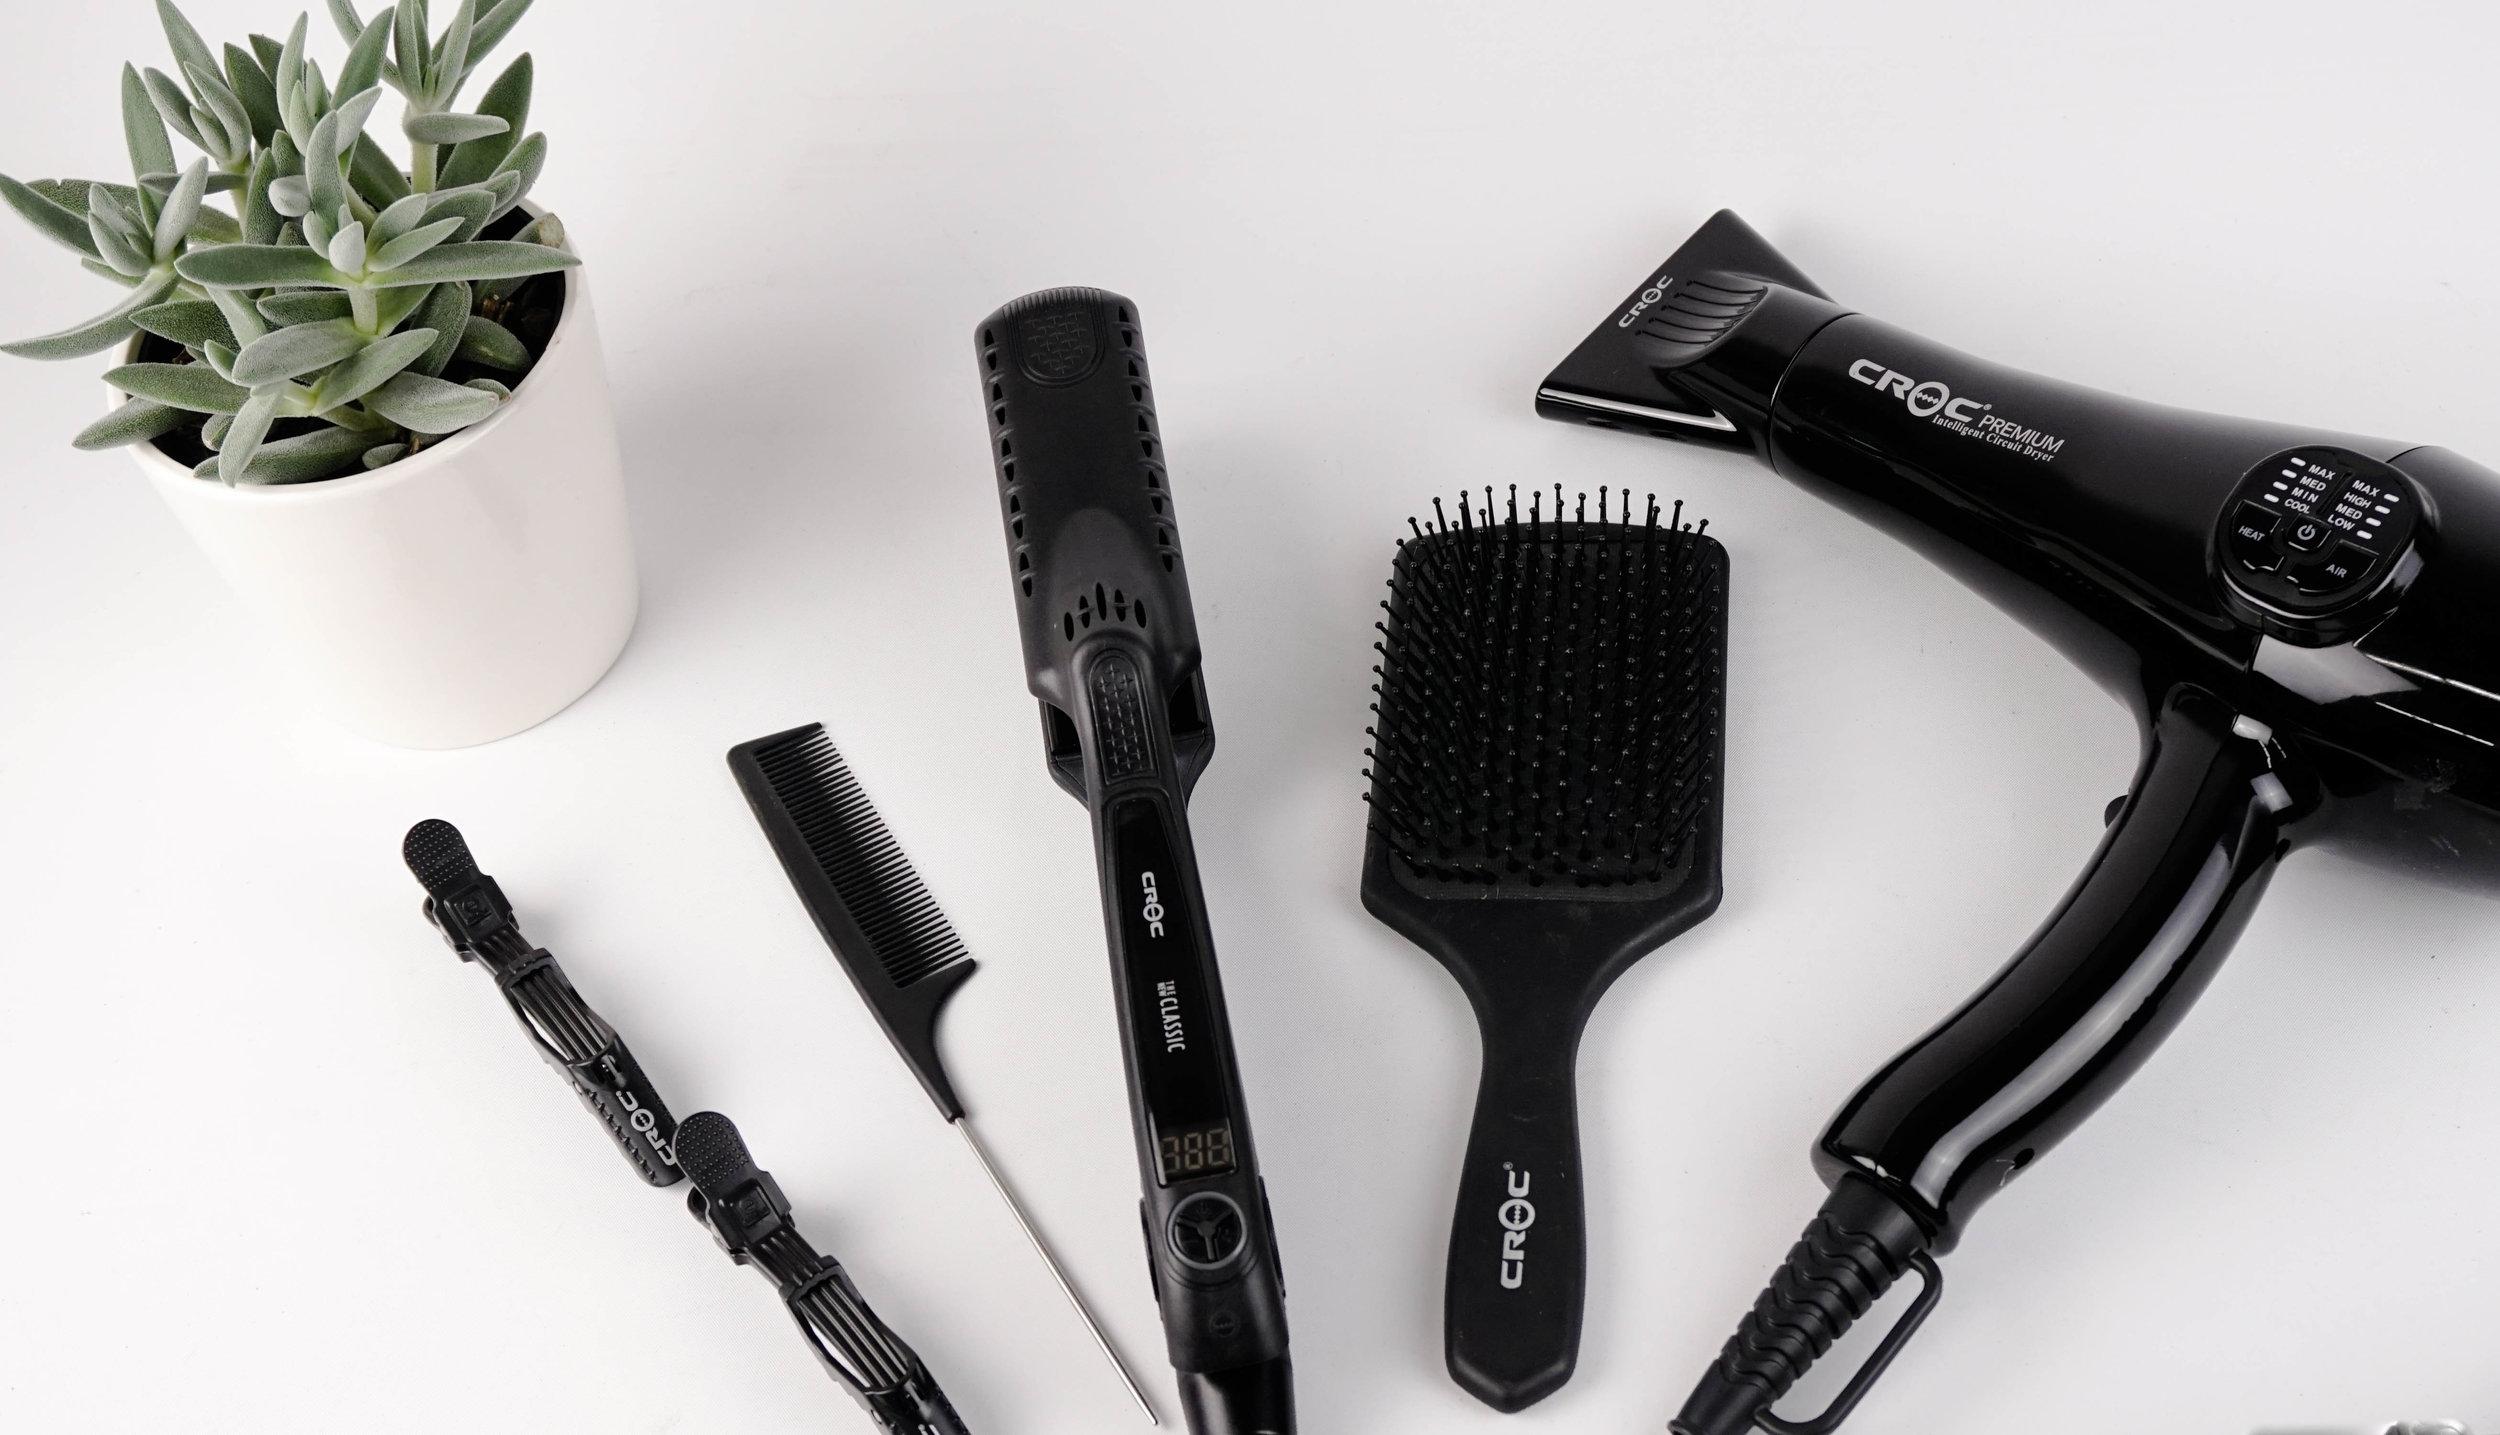 HAIR STYLIST - MEN'S HAIRCUTS SPECIALIST